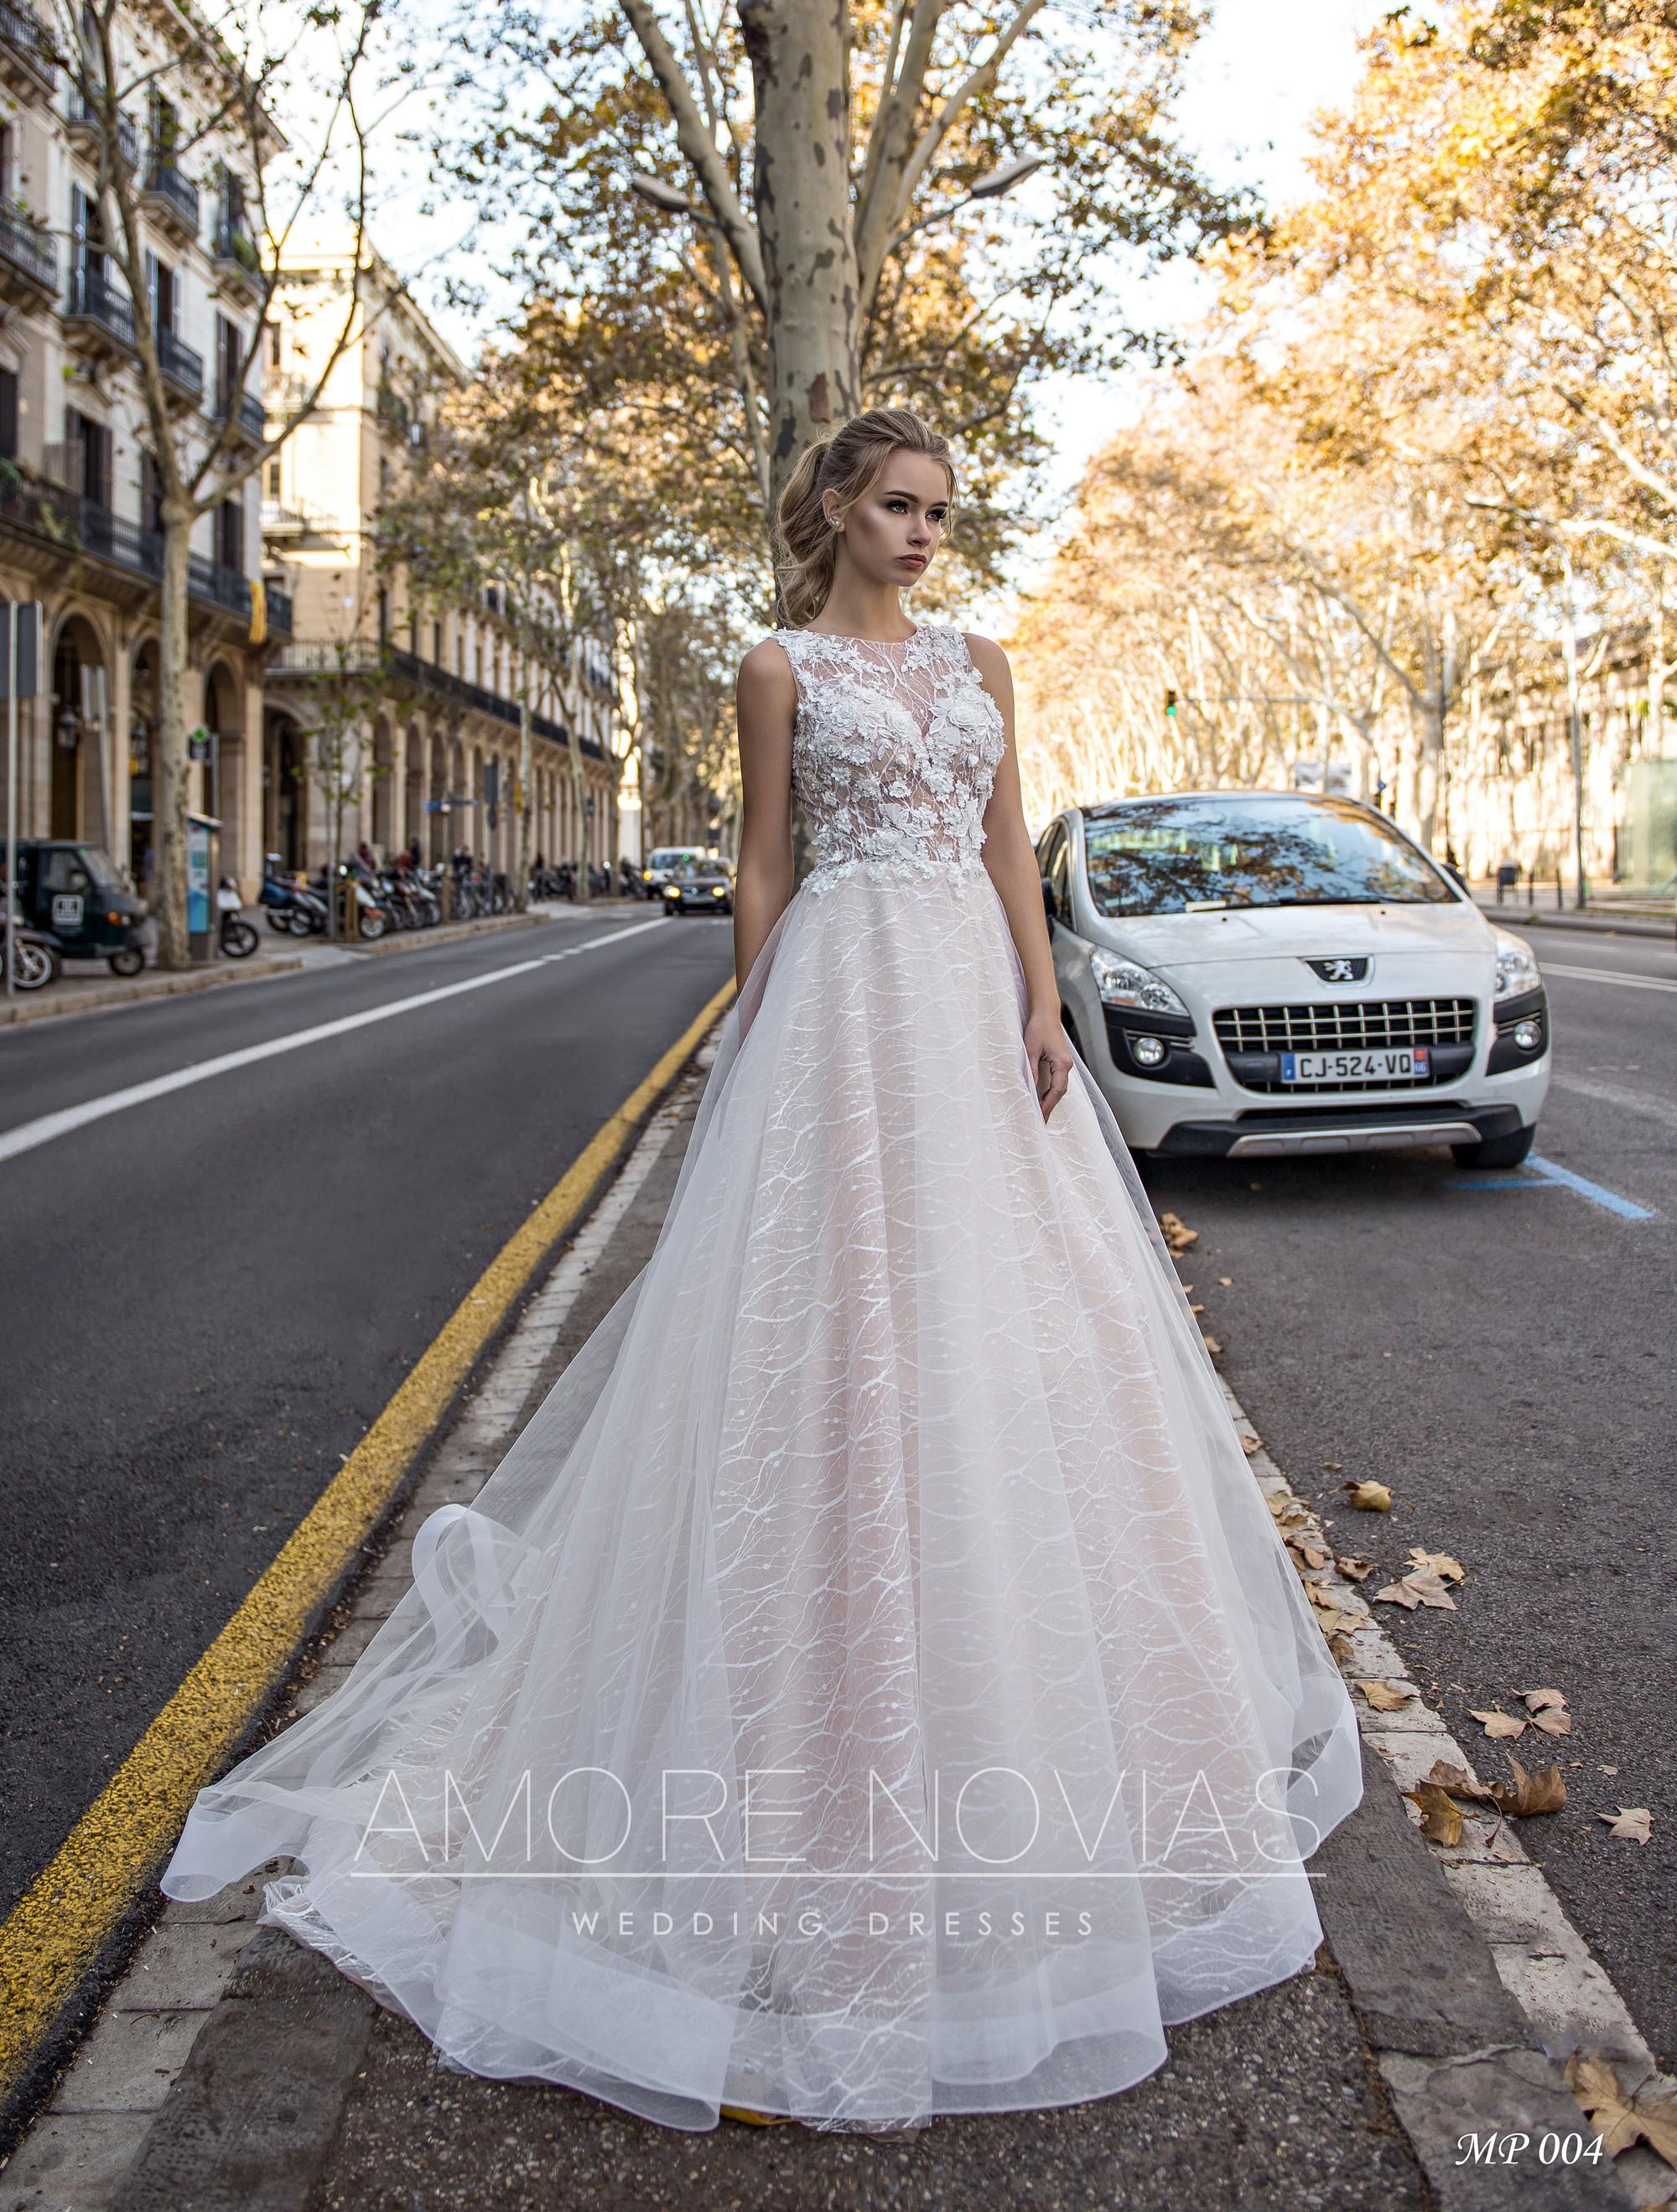 http://amore-novias.com/images/stories/virtuemart/product/mp-004-------(1).jpg